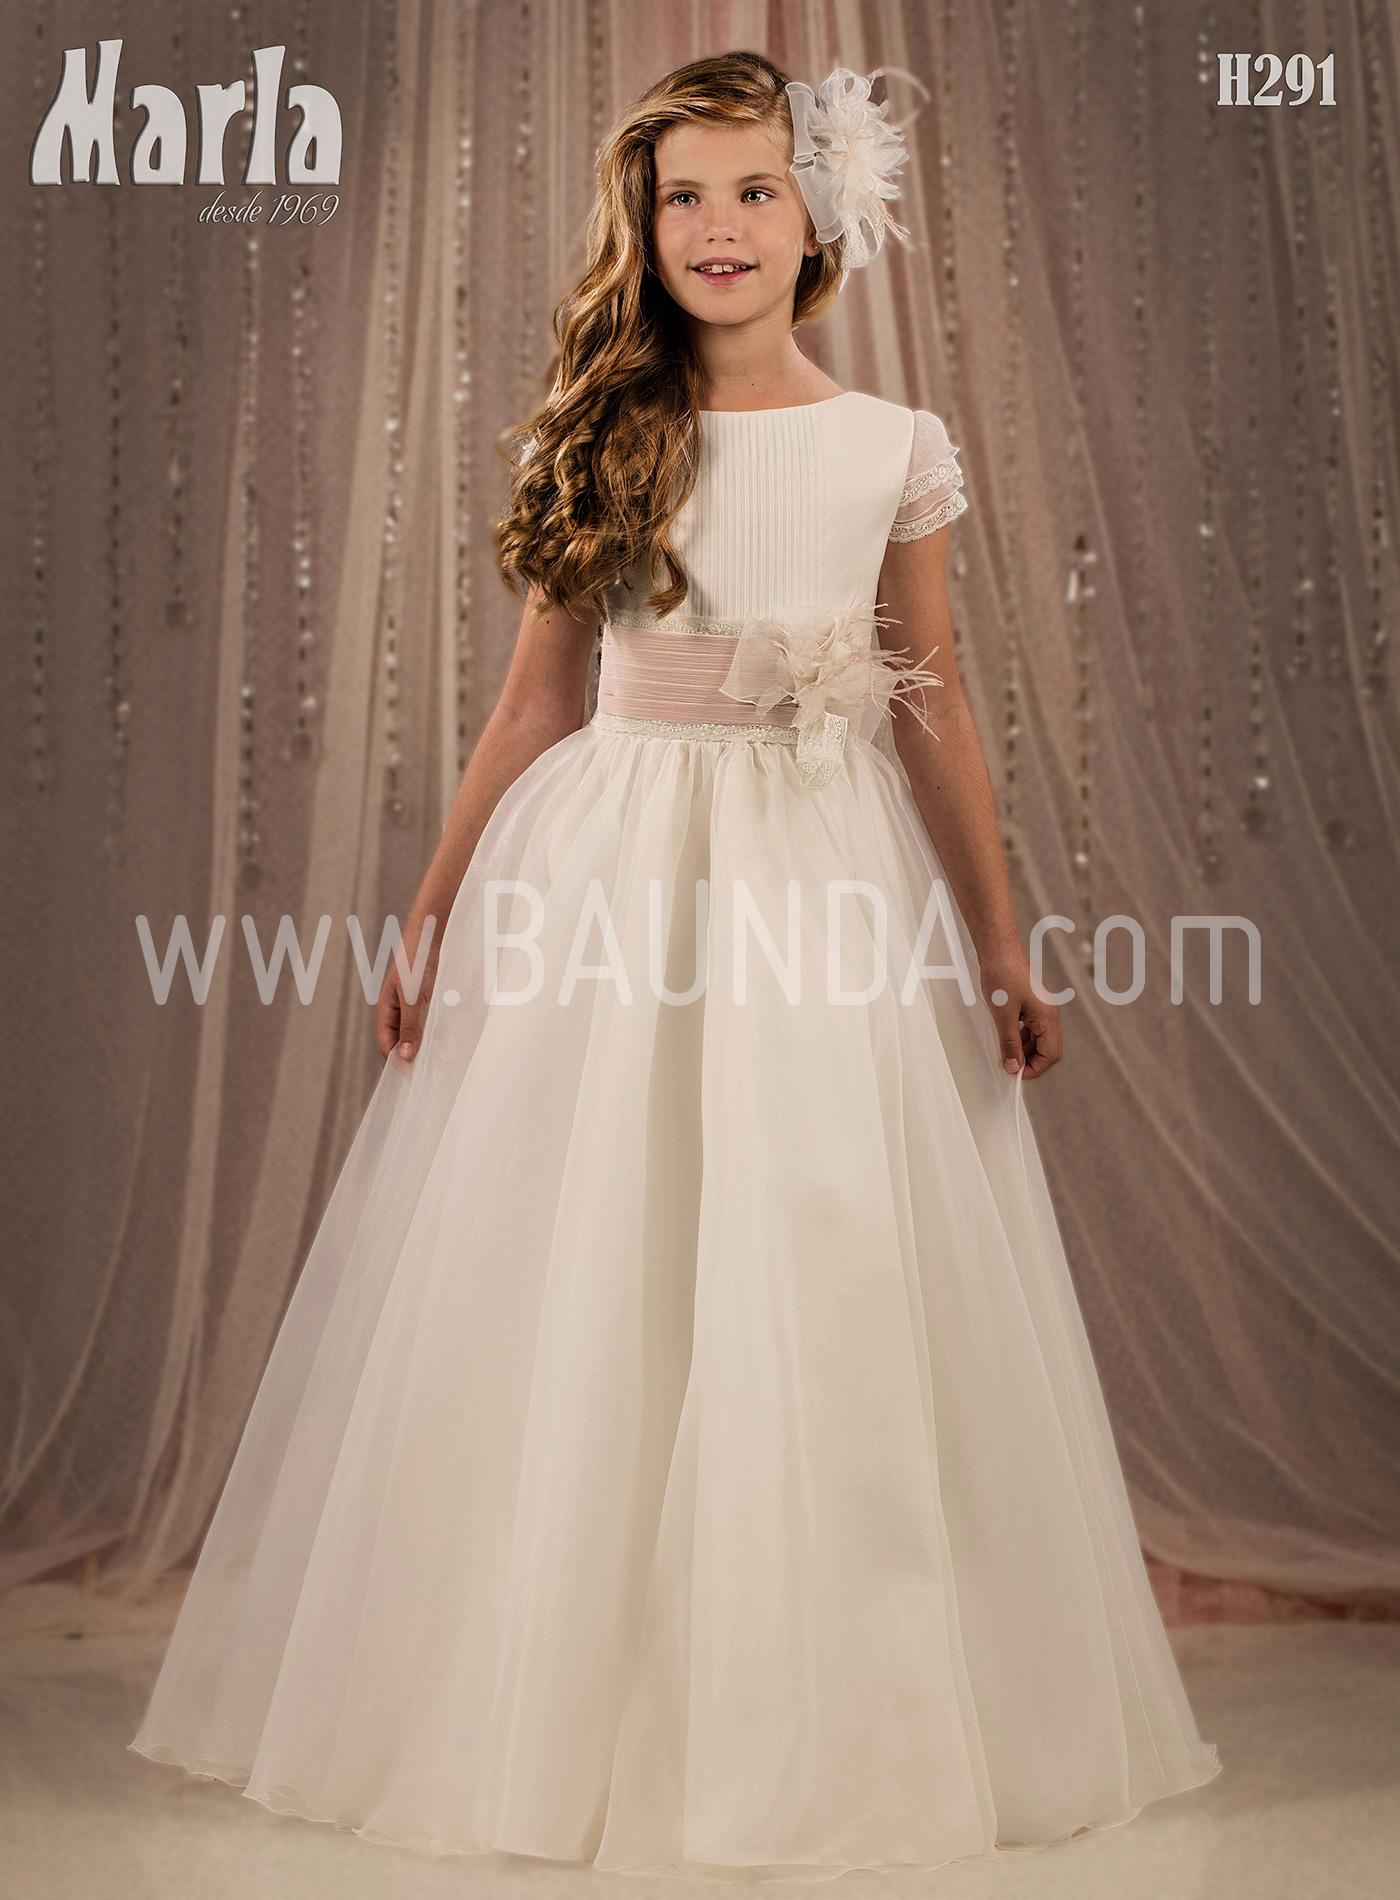 Vestido de comunión falda lisa 2018 Marla modelo H291